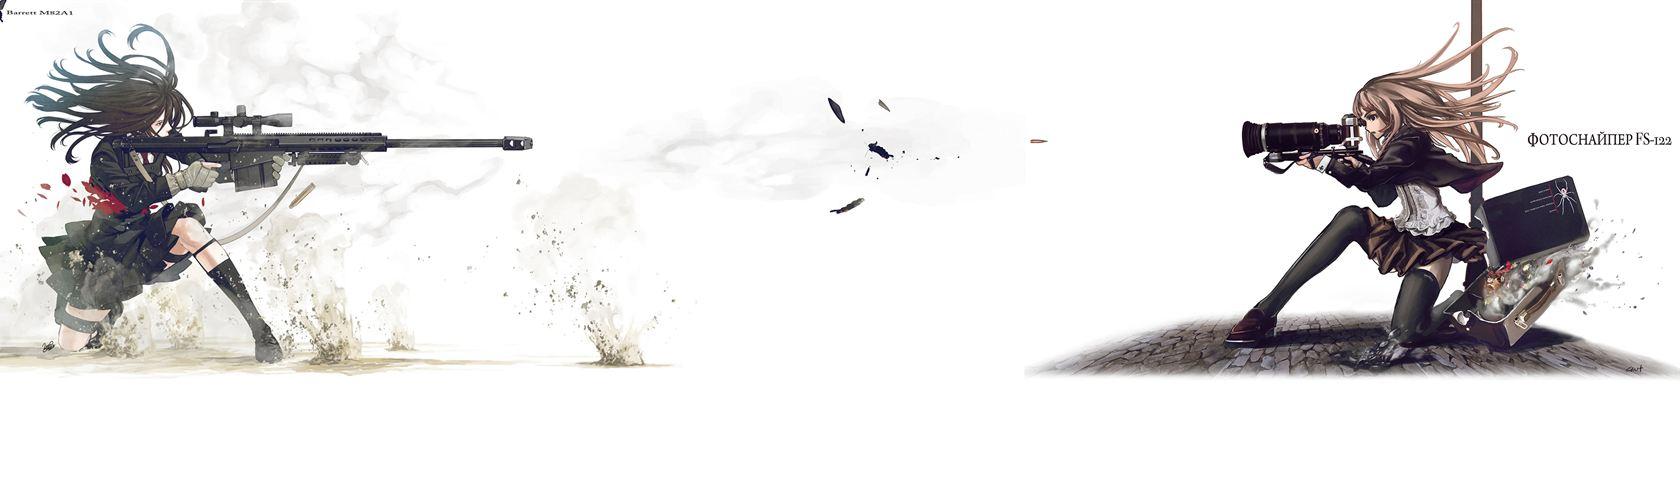 Gun Vs Camera 2048 X 1152 Anime 1832573 Hd Wallpaper